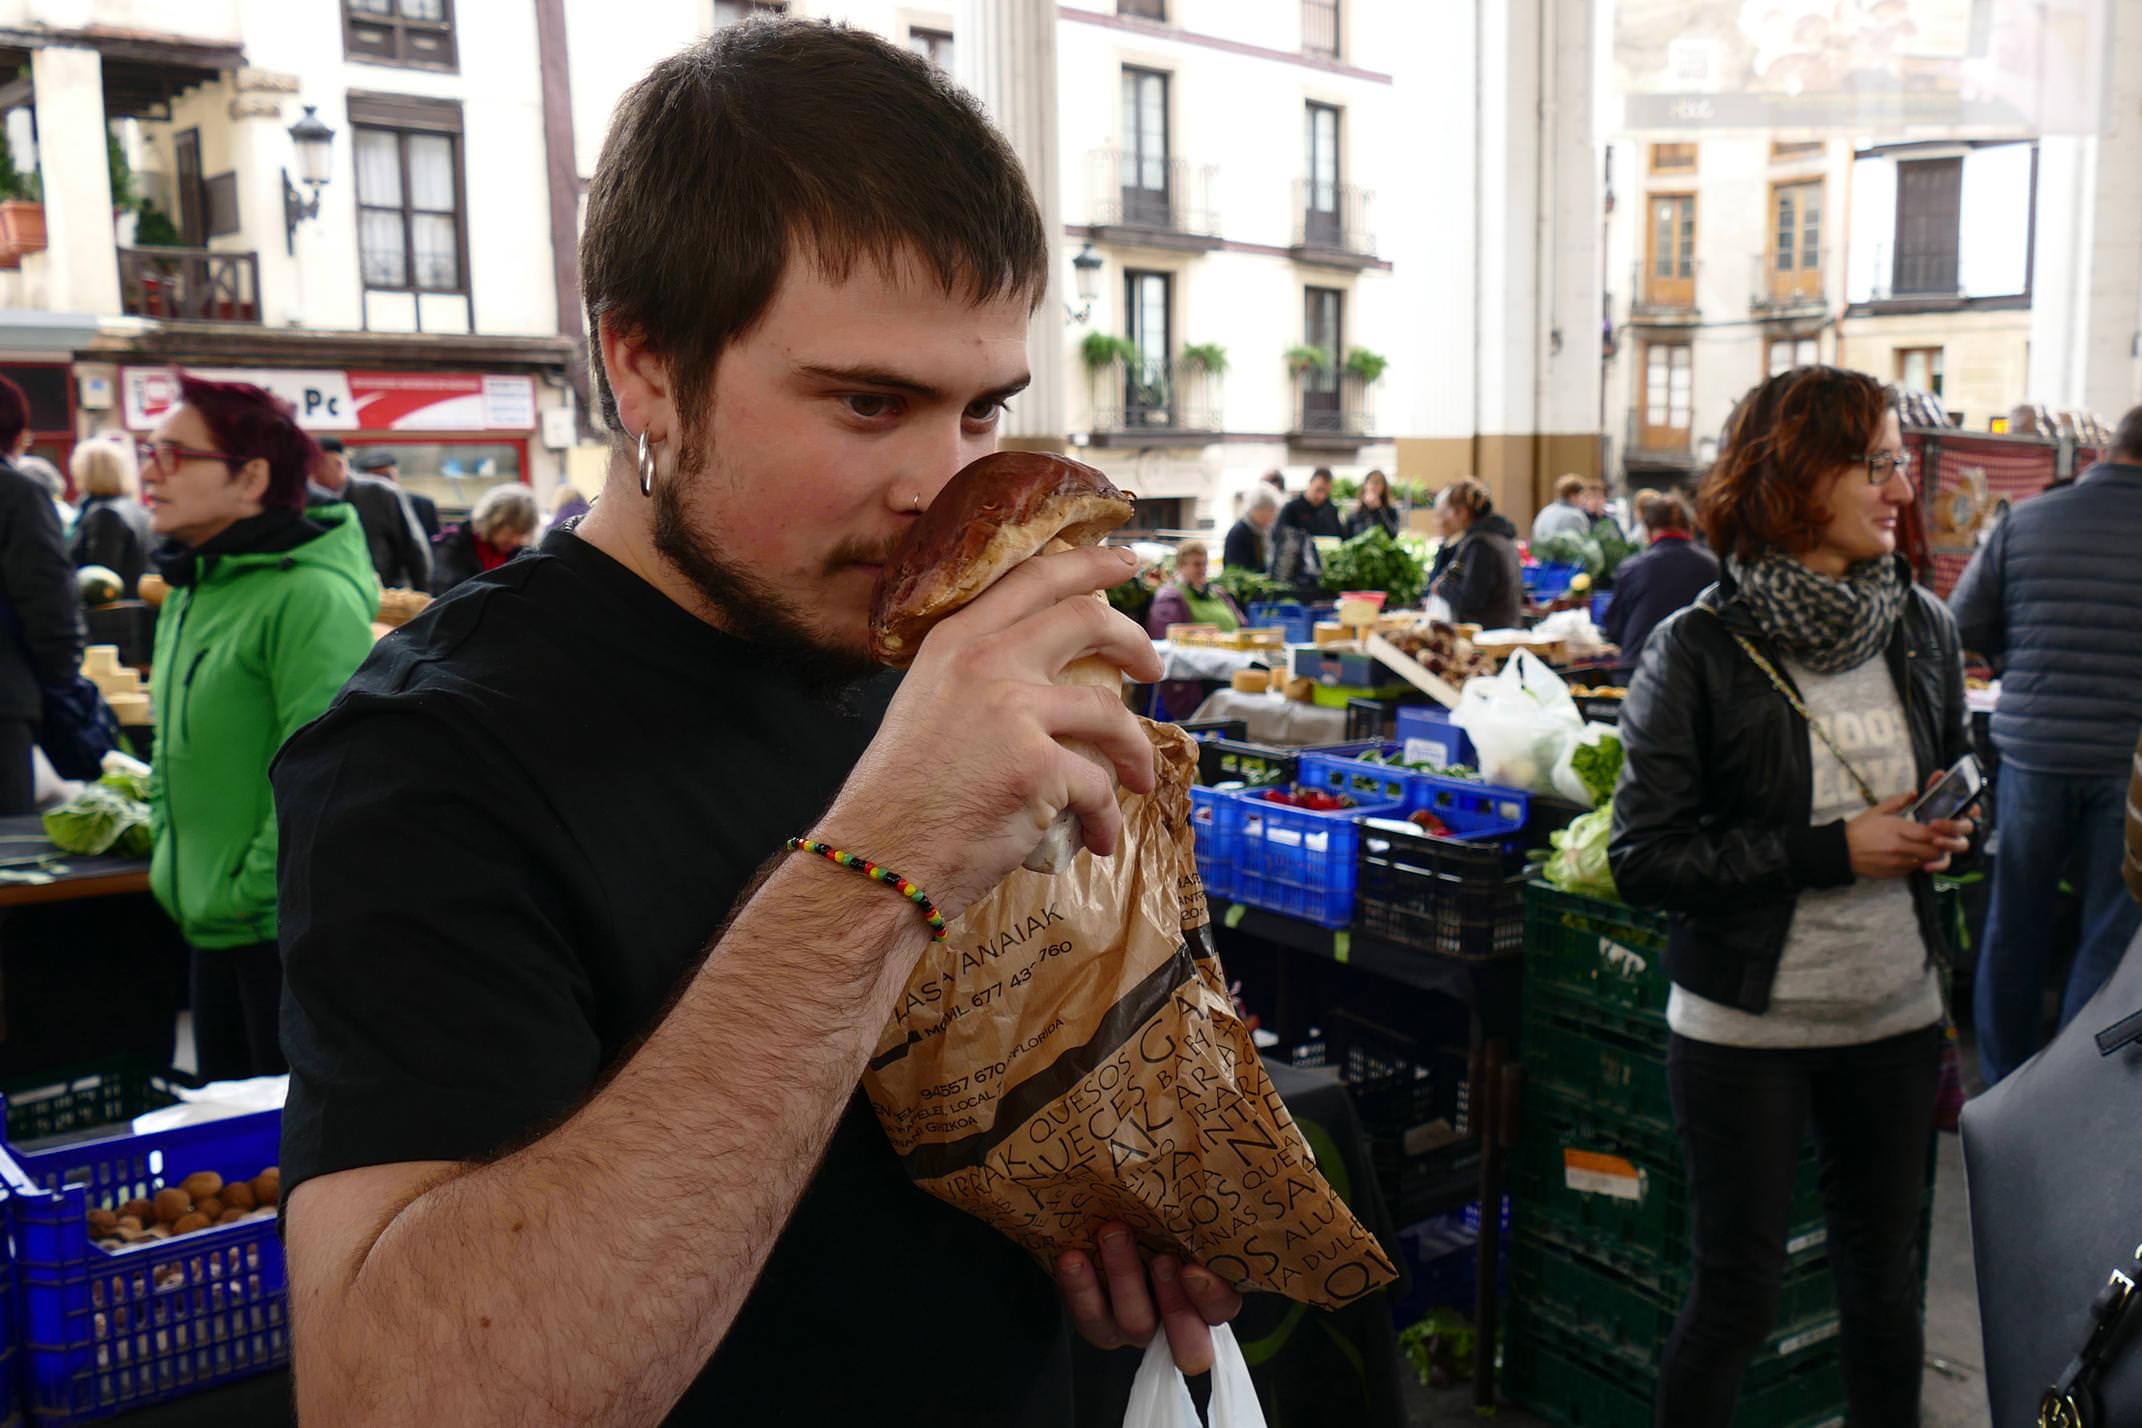 Spain basque country ordizia market chef smelling boletus mushroom